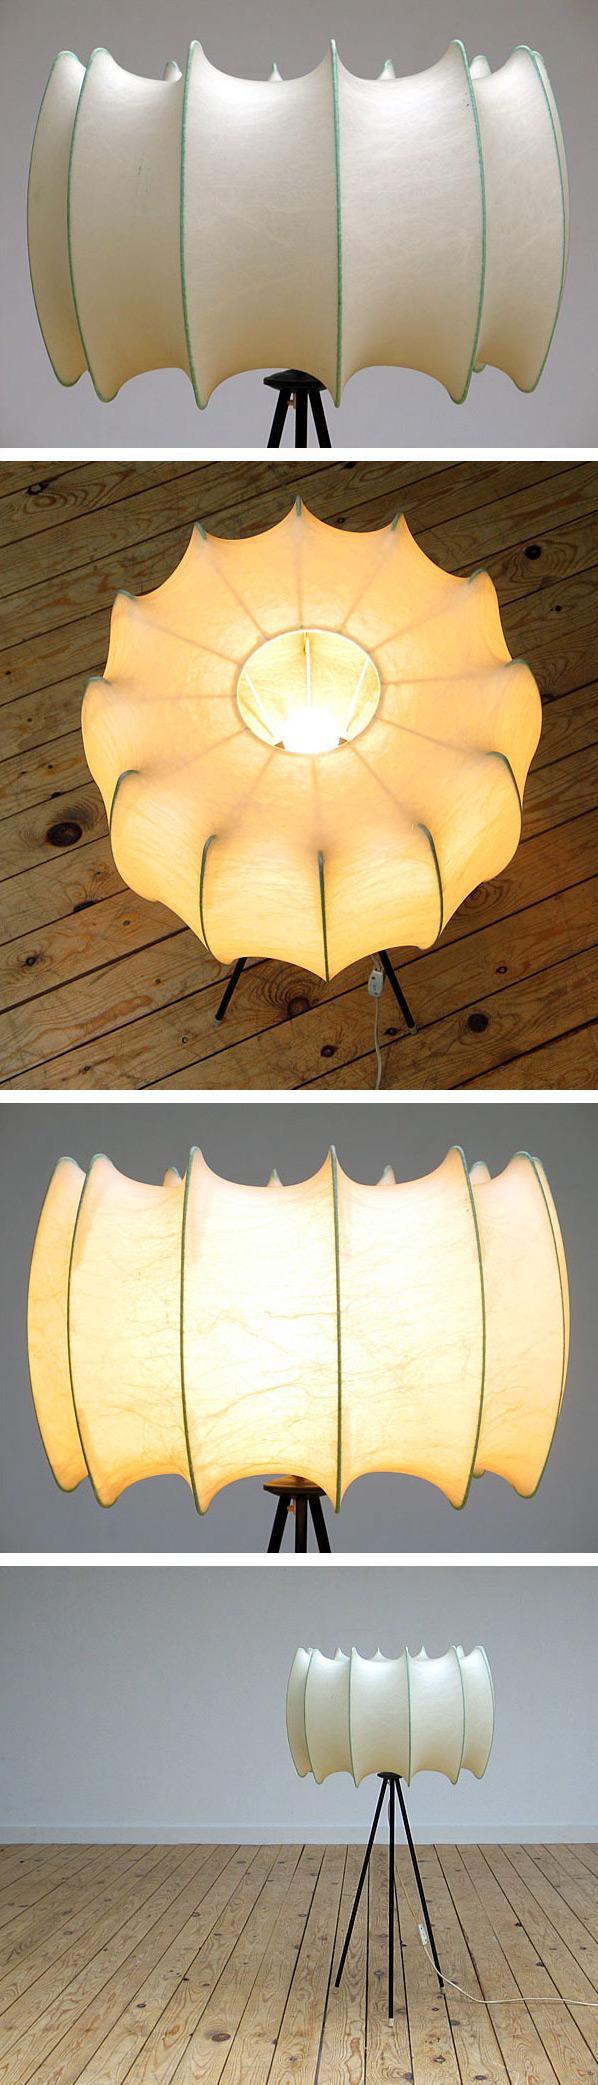 Cocoon lamp Castiglioni Flos Bovezzo Italy Large